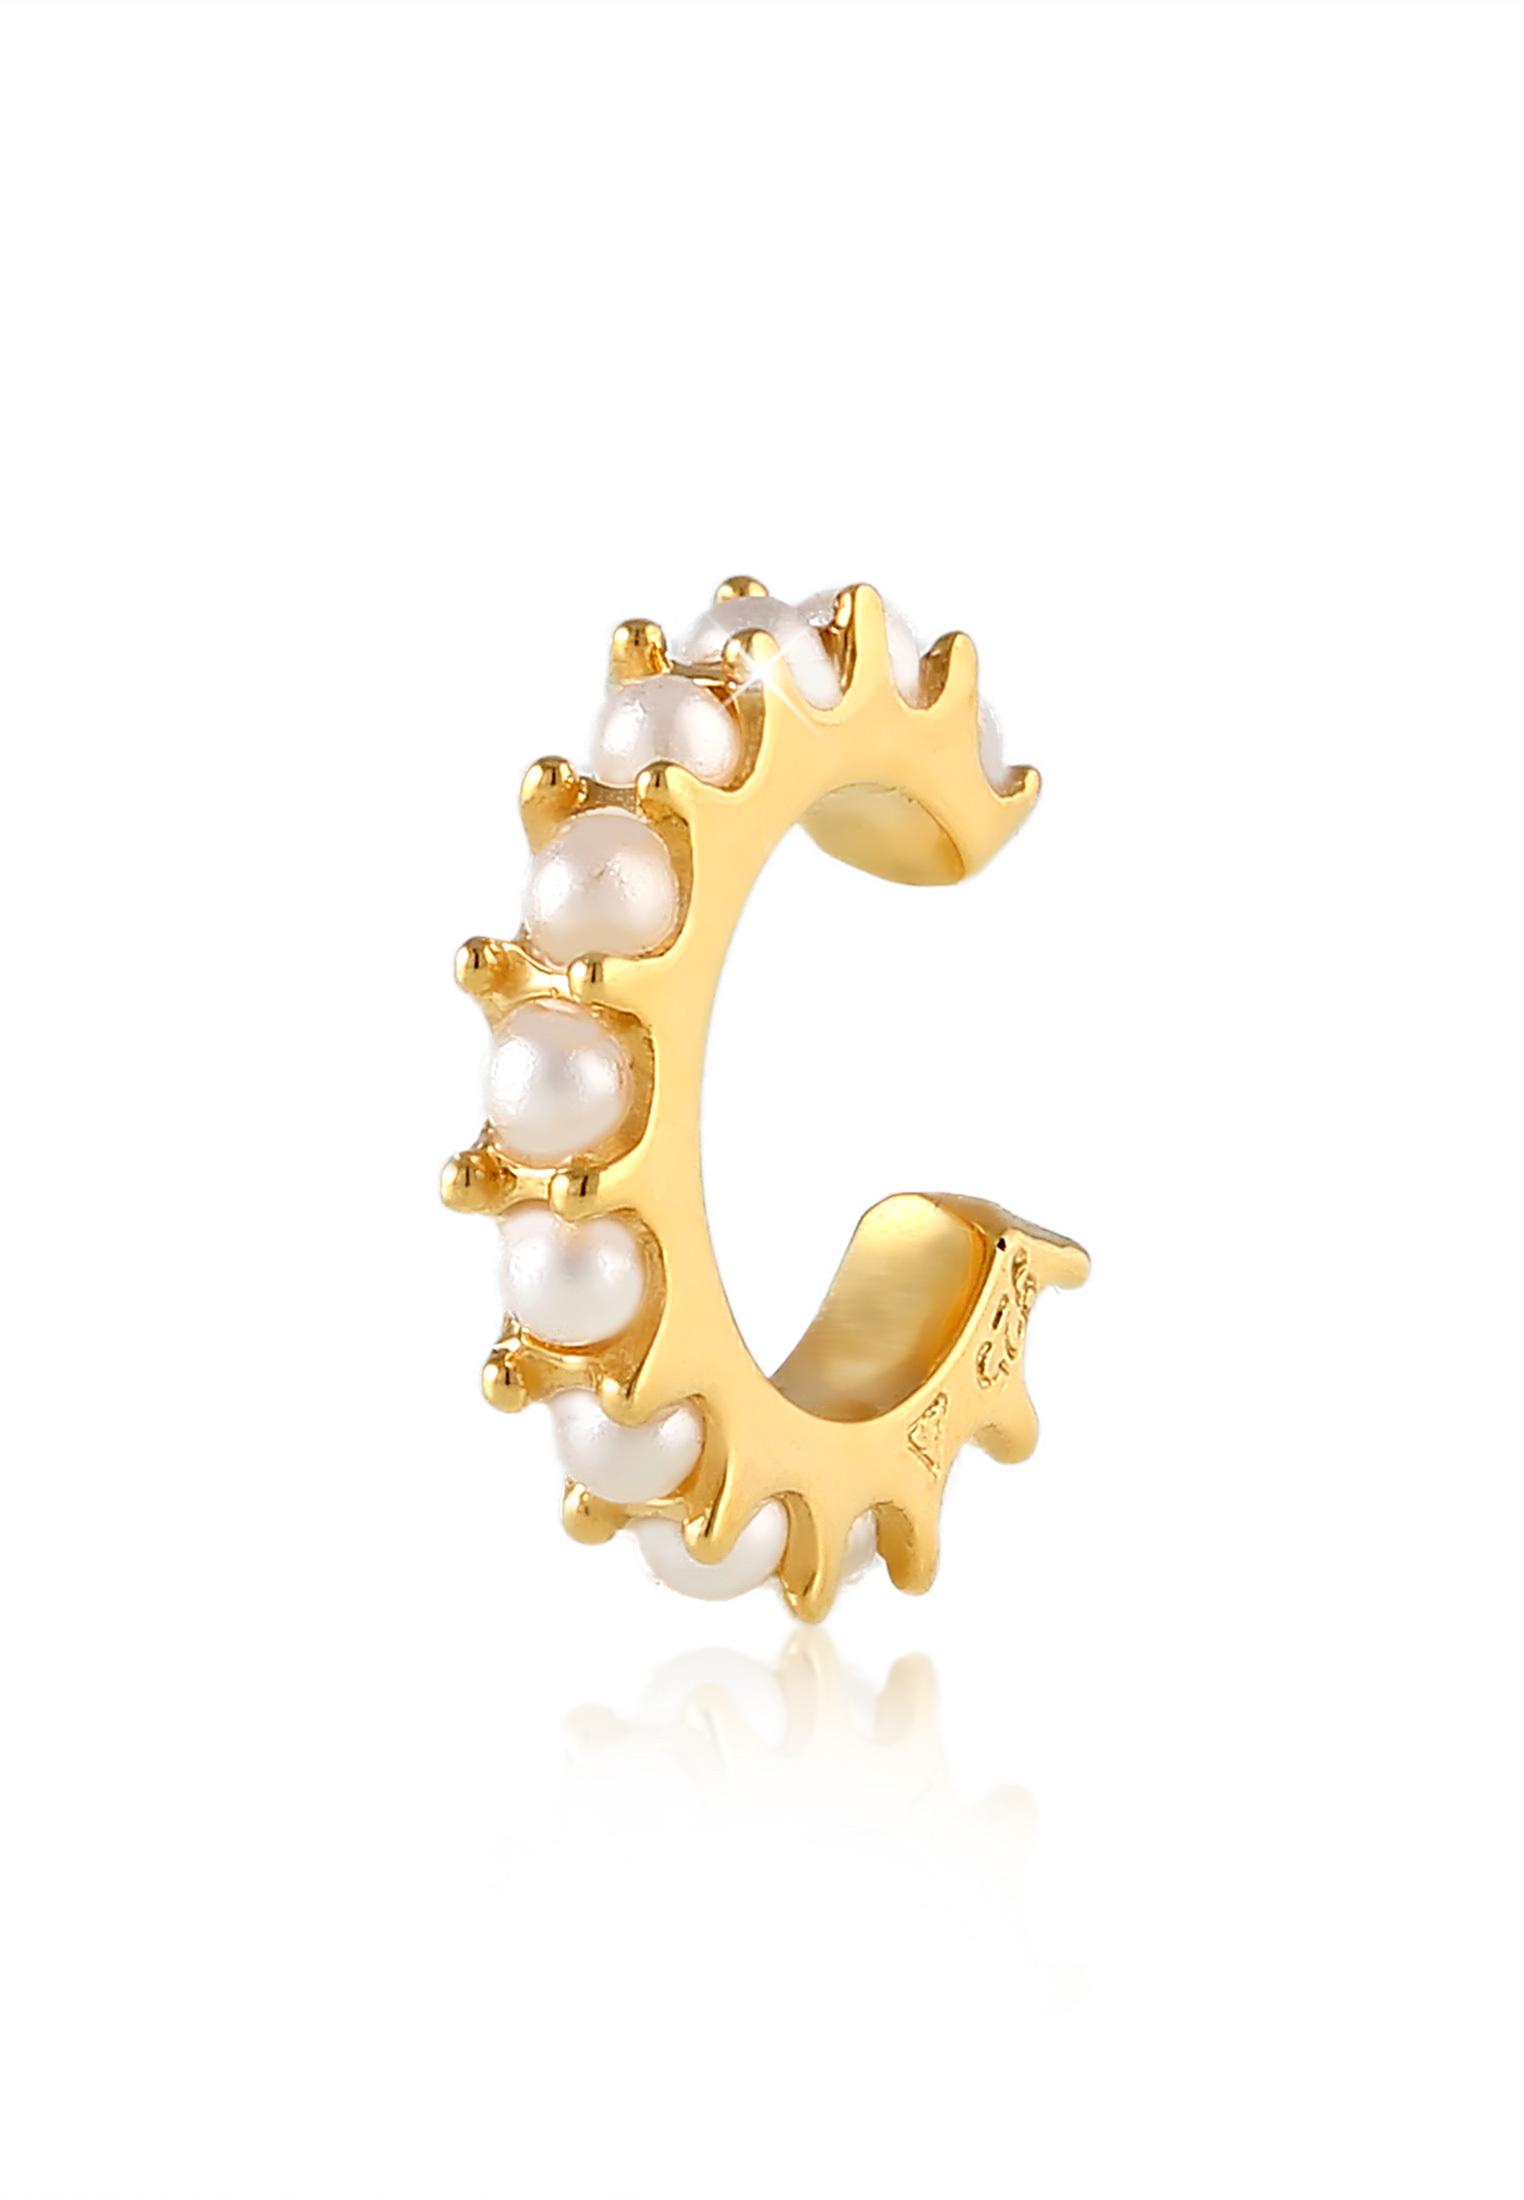 Earcuff | Perle | 925 Sterling Silber vergoldet